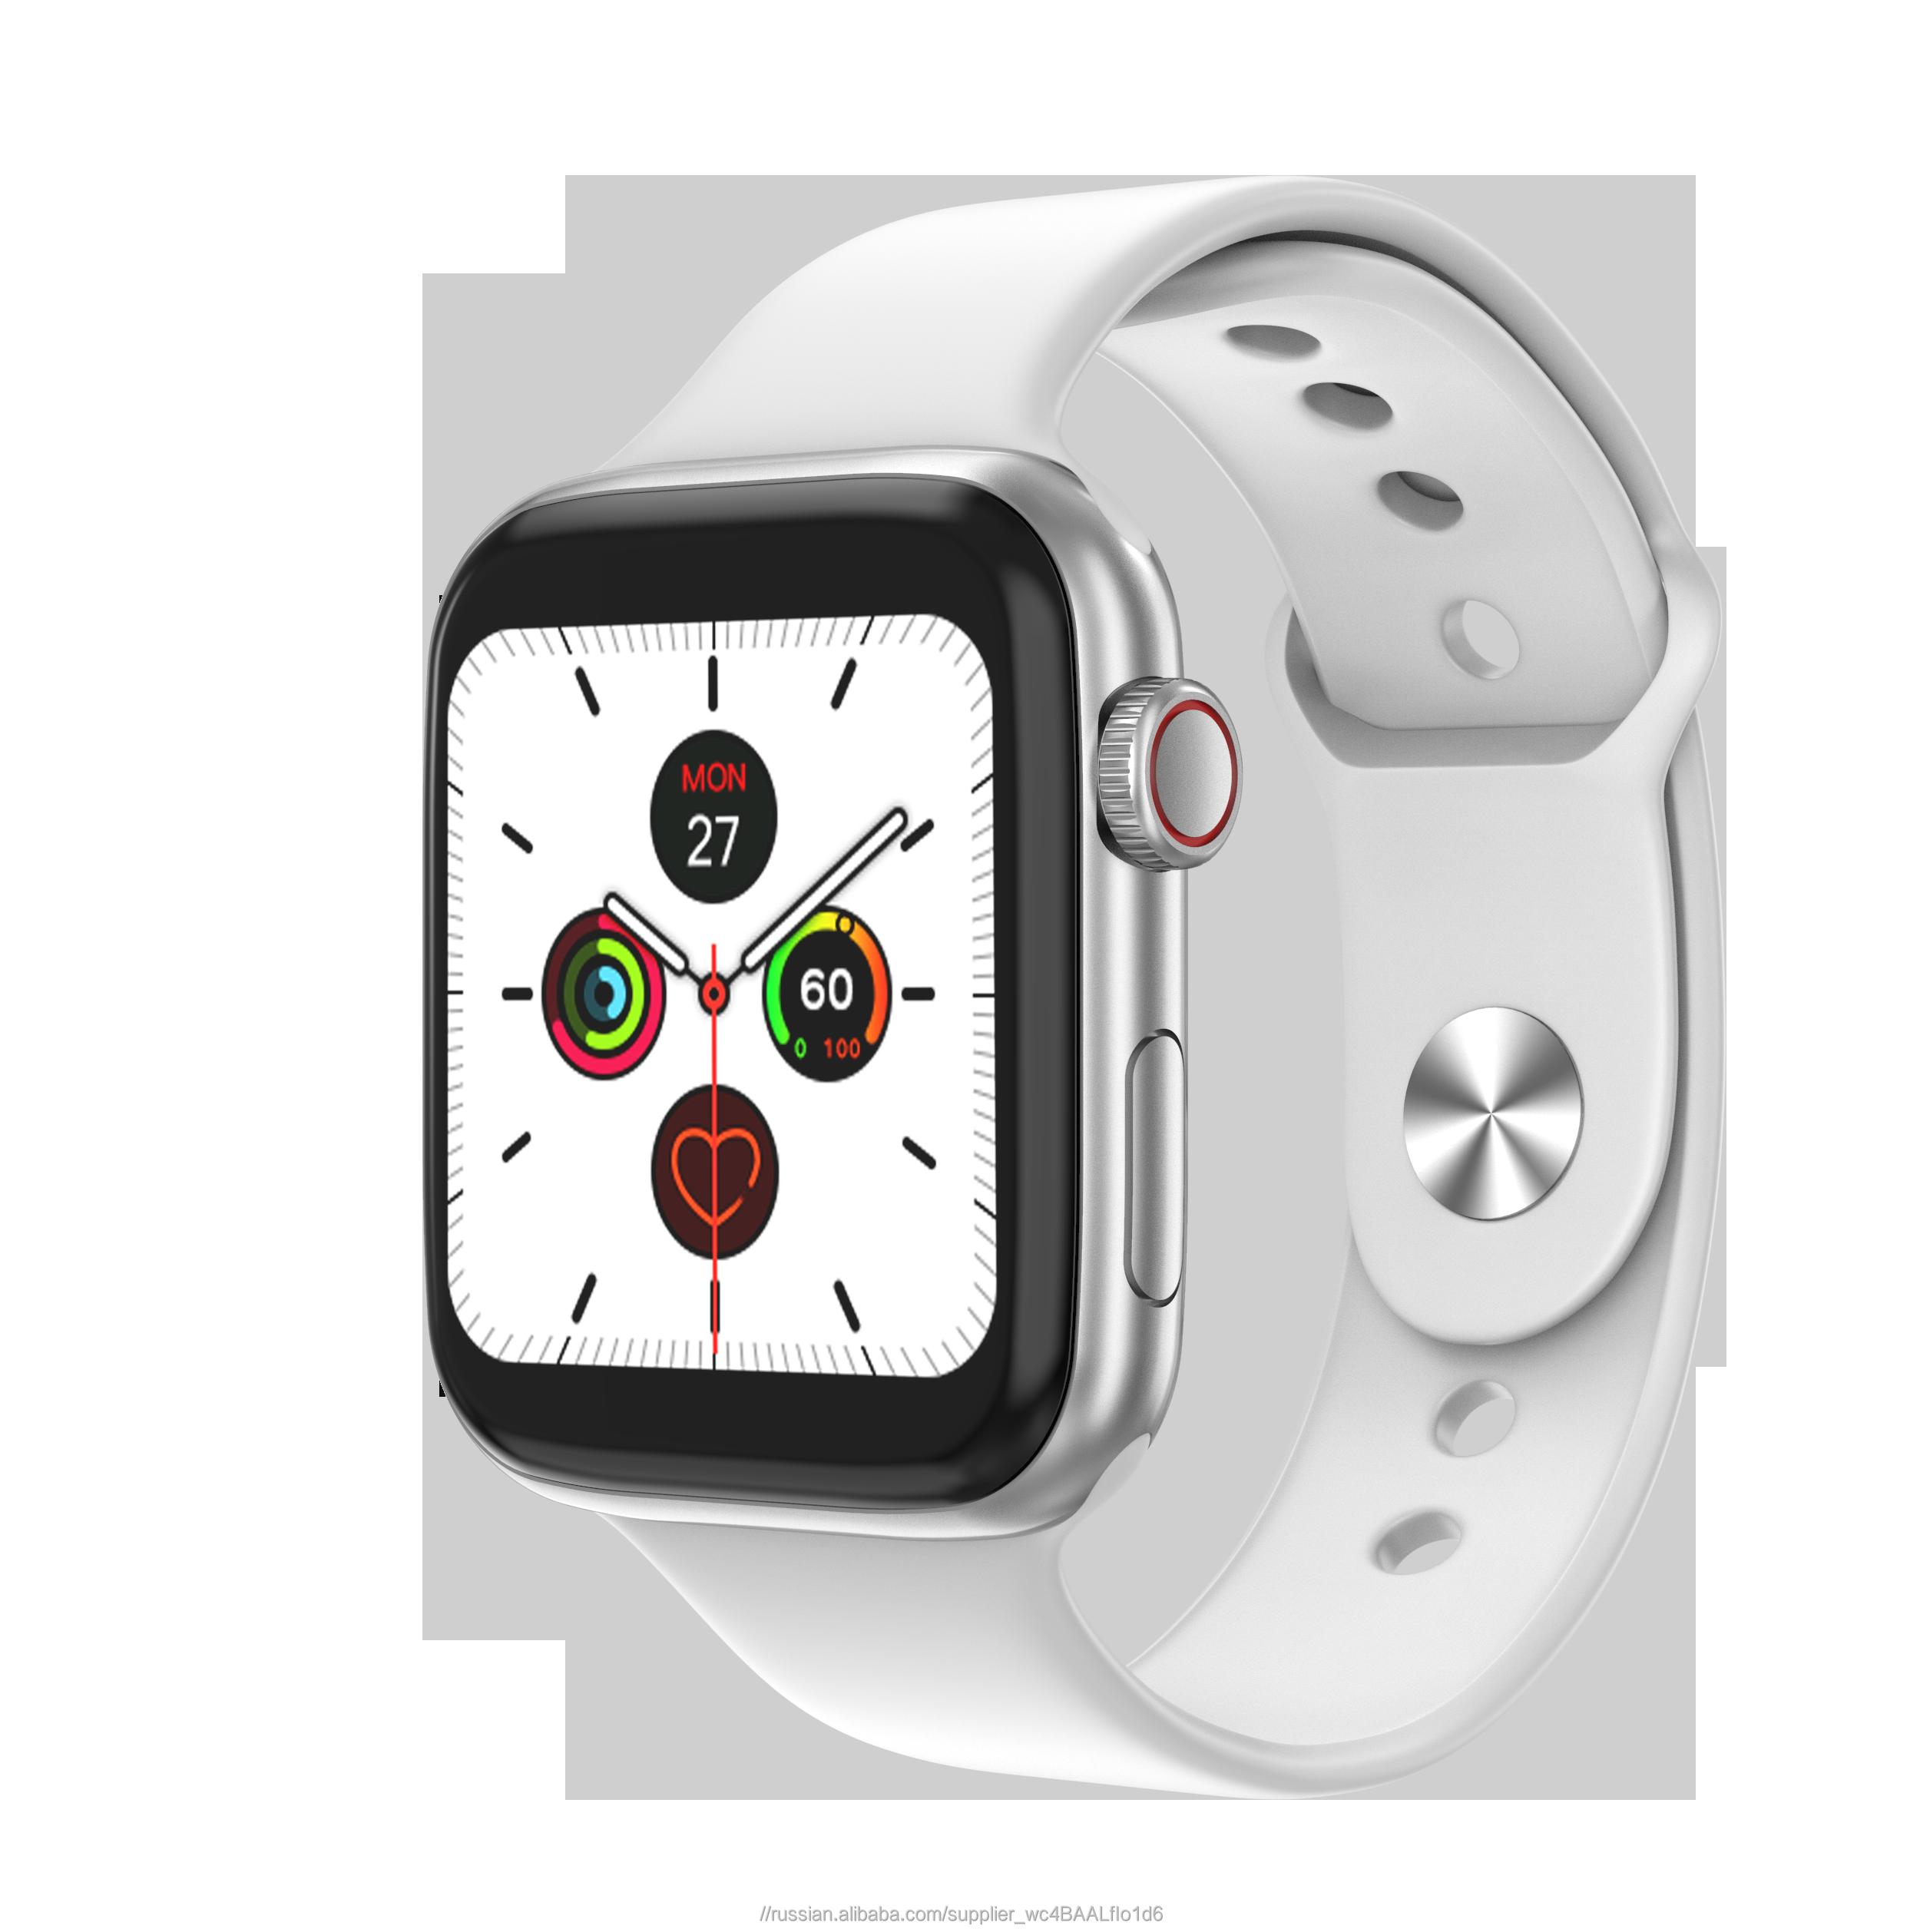 W20 Смарт-часы ЭКГ + PPG series 5 heart rate monitor отслеживание занятий спортом ip67 для Apple <span class=keywords><strong>Huawei</strong></span> Samsung IOS <span class=keywords><strong>Android</strong></span> w34 Смарт-часы